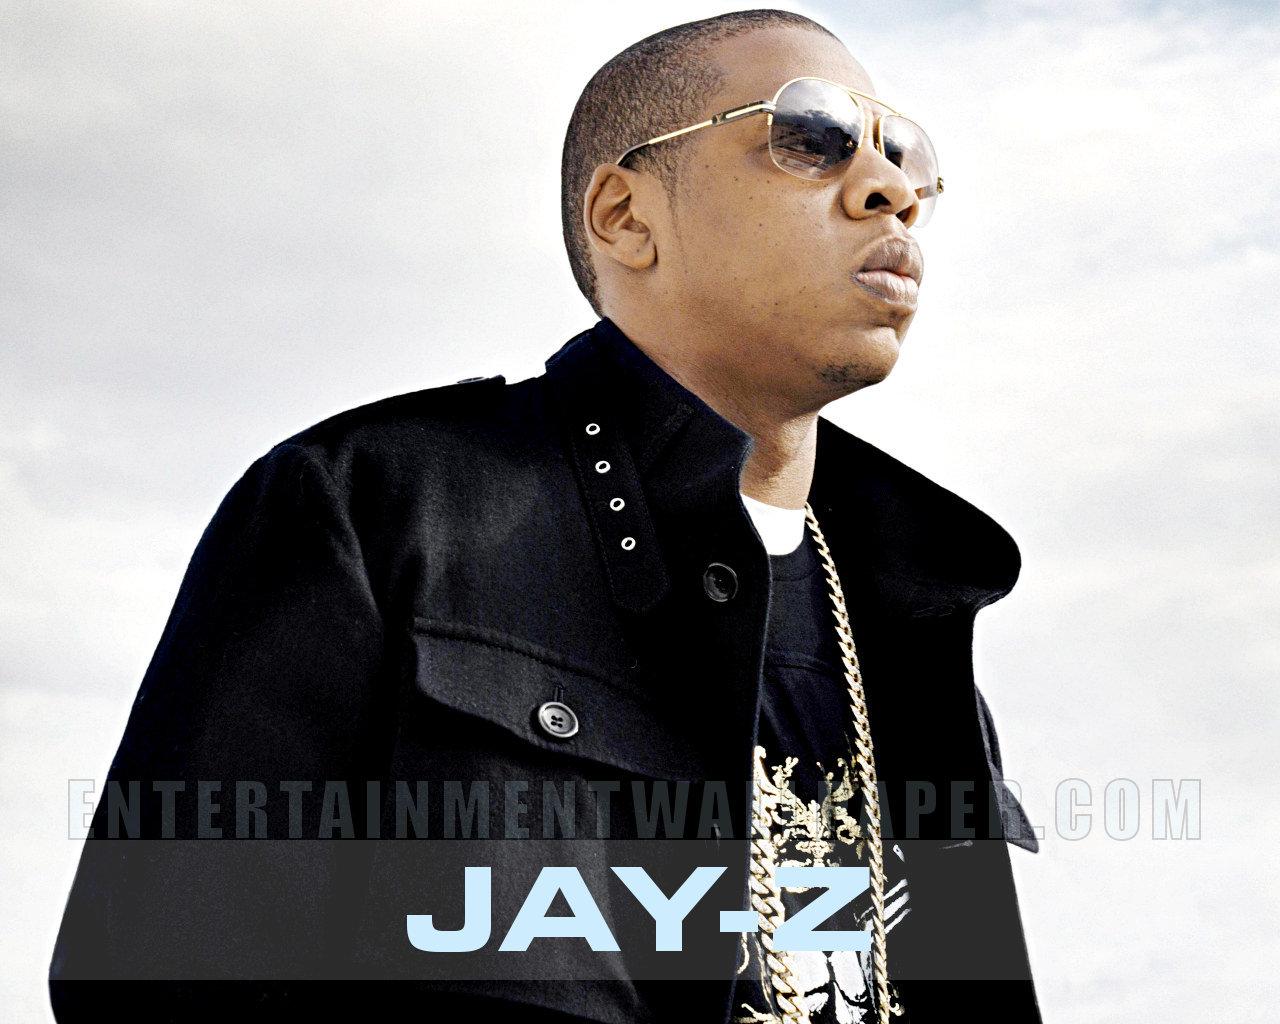 Jay Z Cool Dude Wallpaper 1280 X 1024 80182 HD Wallpaper 1280x1024